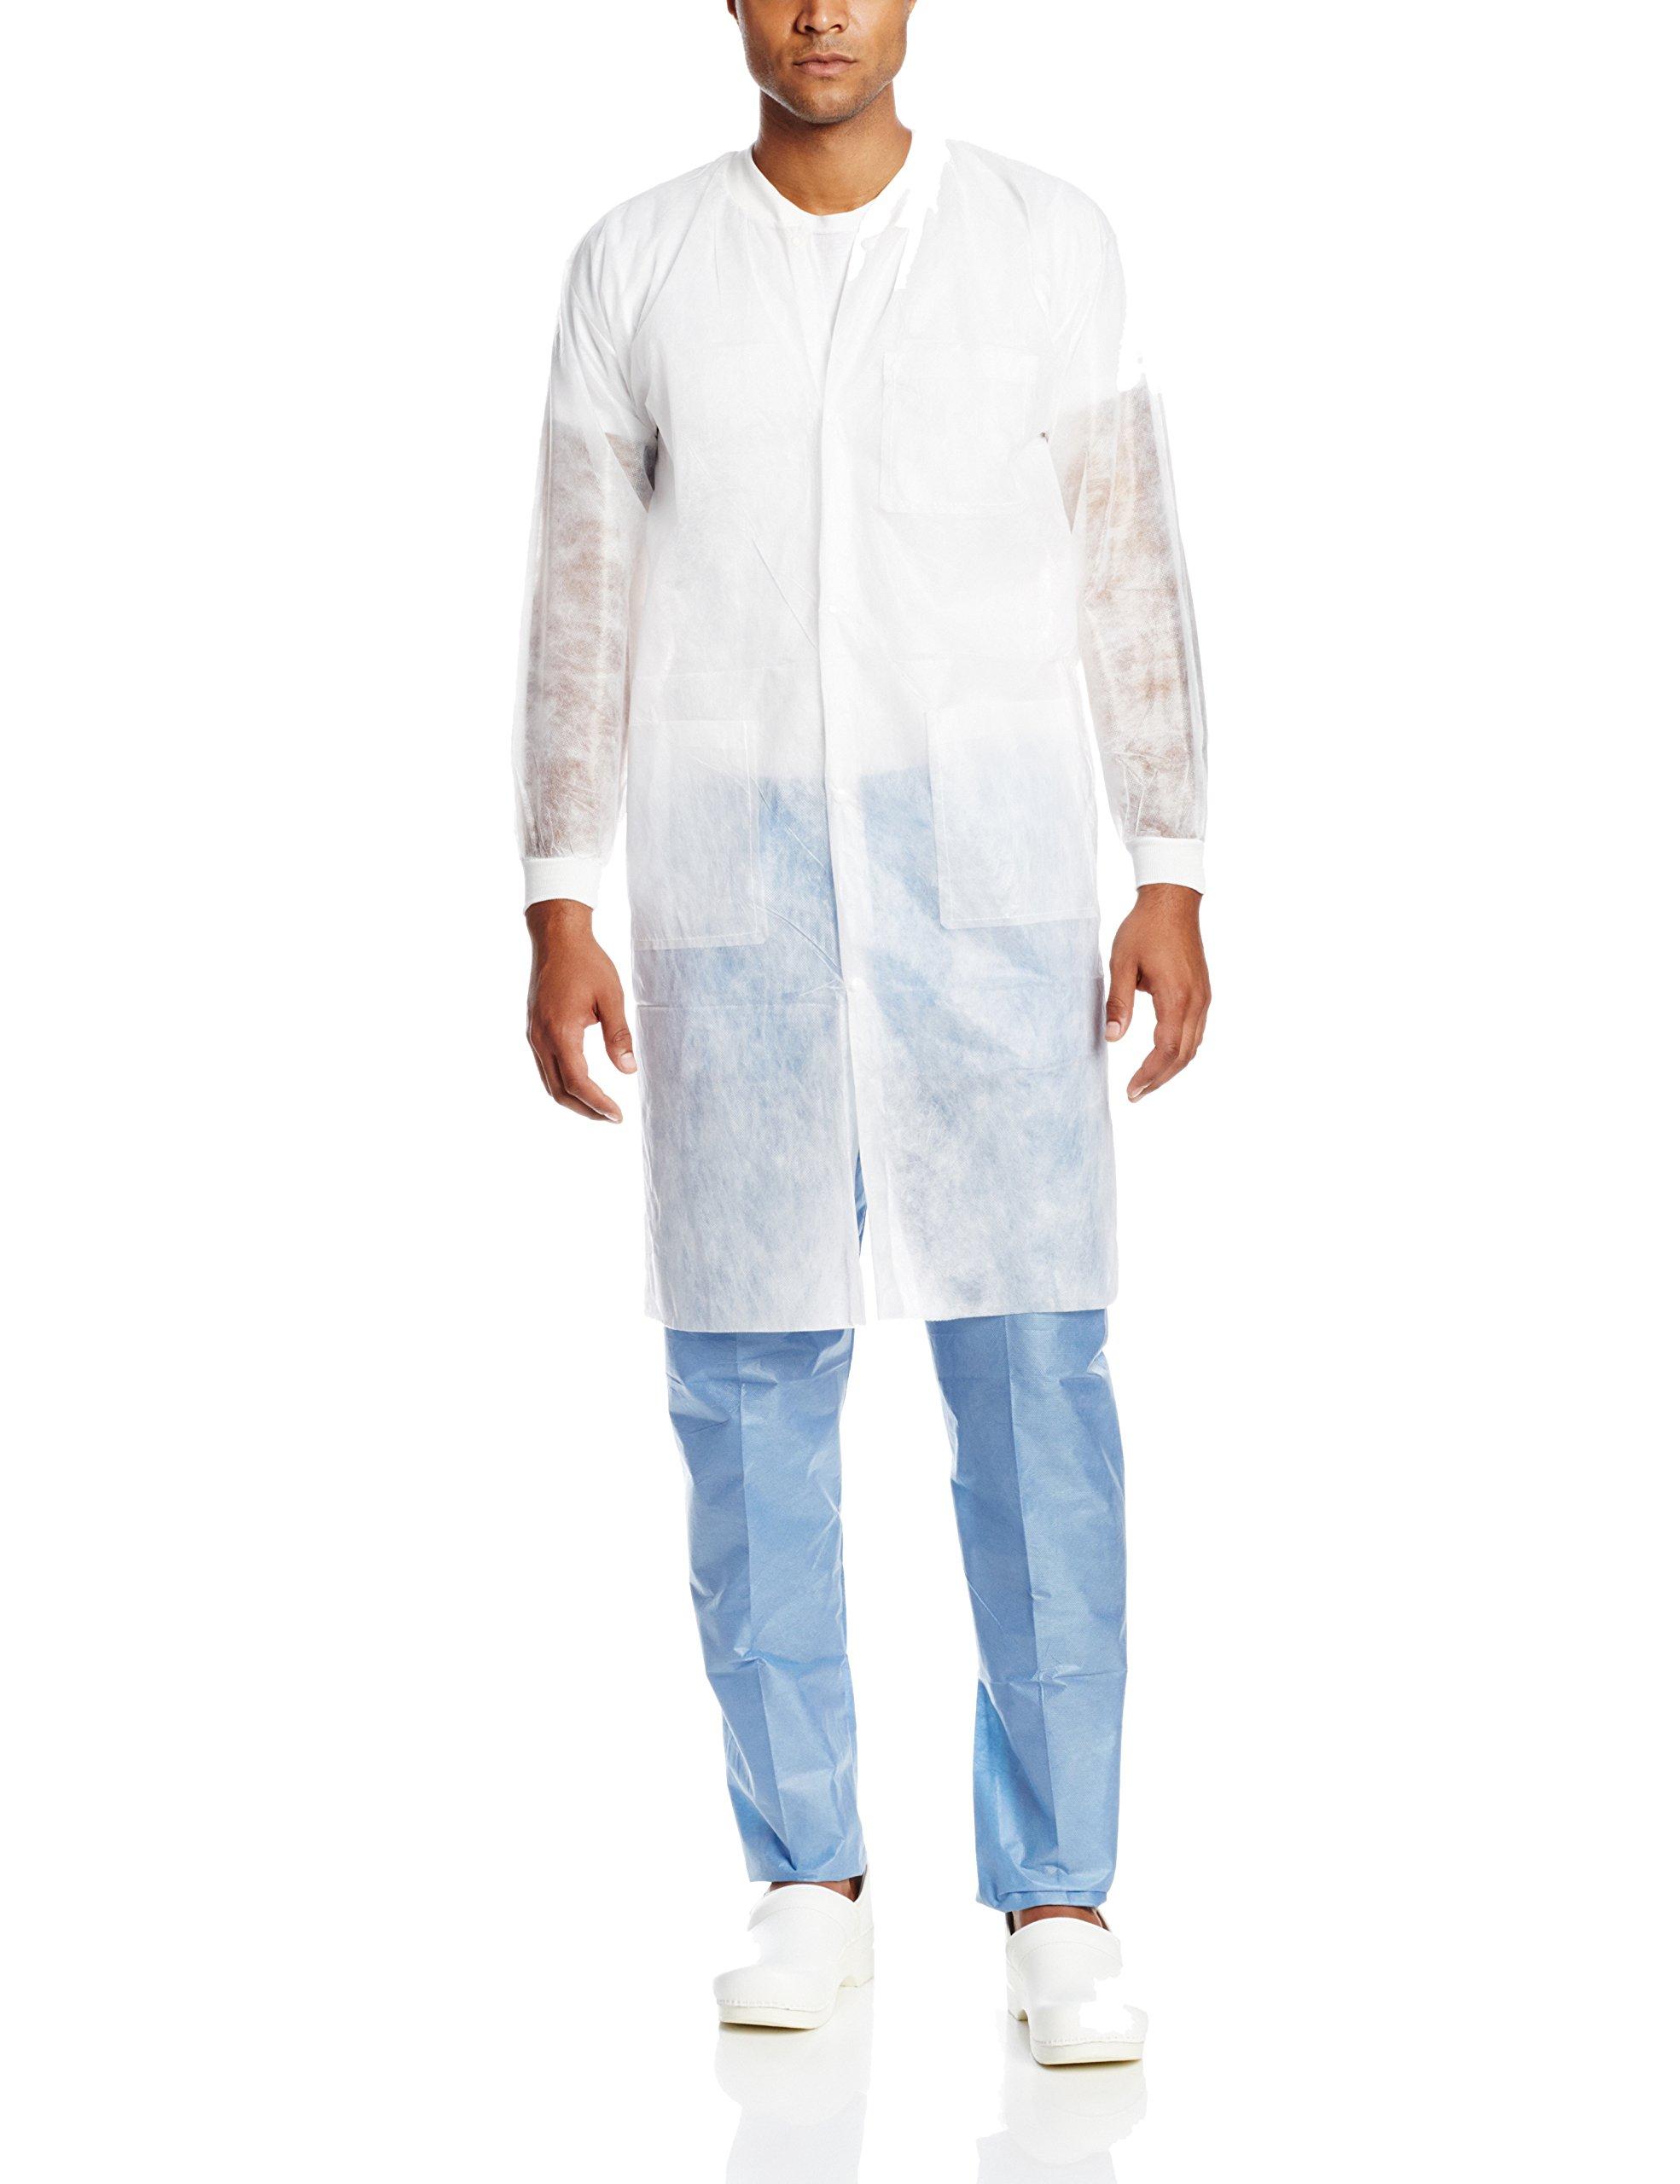 ValuMax 3290WHL Money-Saver, Disposable Isolation Knee Length Lab Coat, Splash Resistant, White, L, Pack of 10